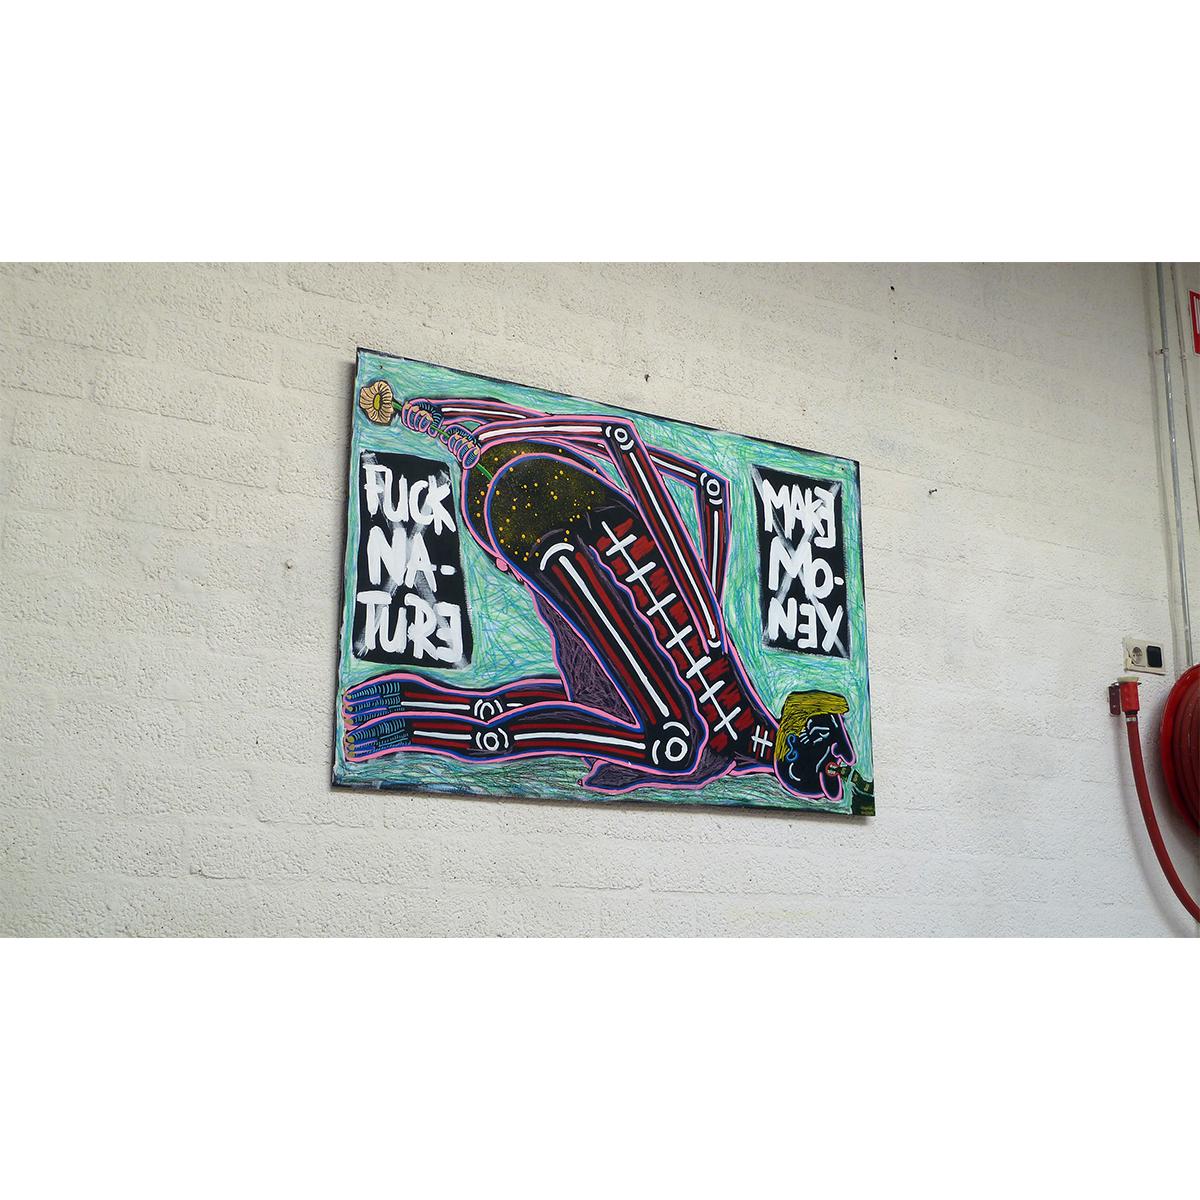 FUCK NATURE, MAKE MONEY 01 - Frank Willems